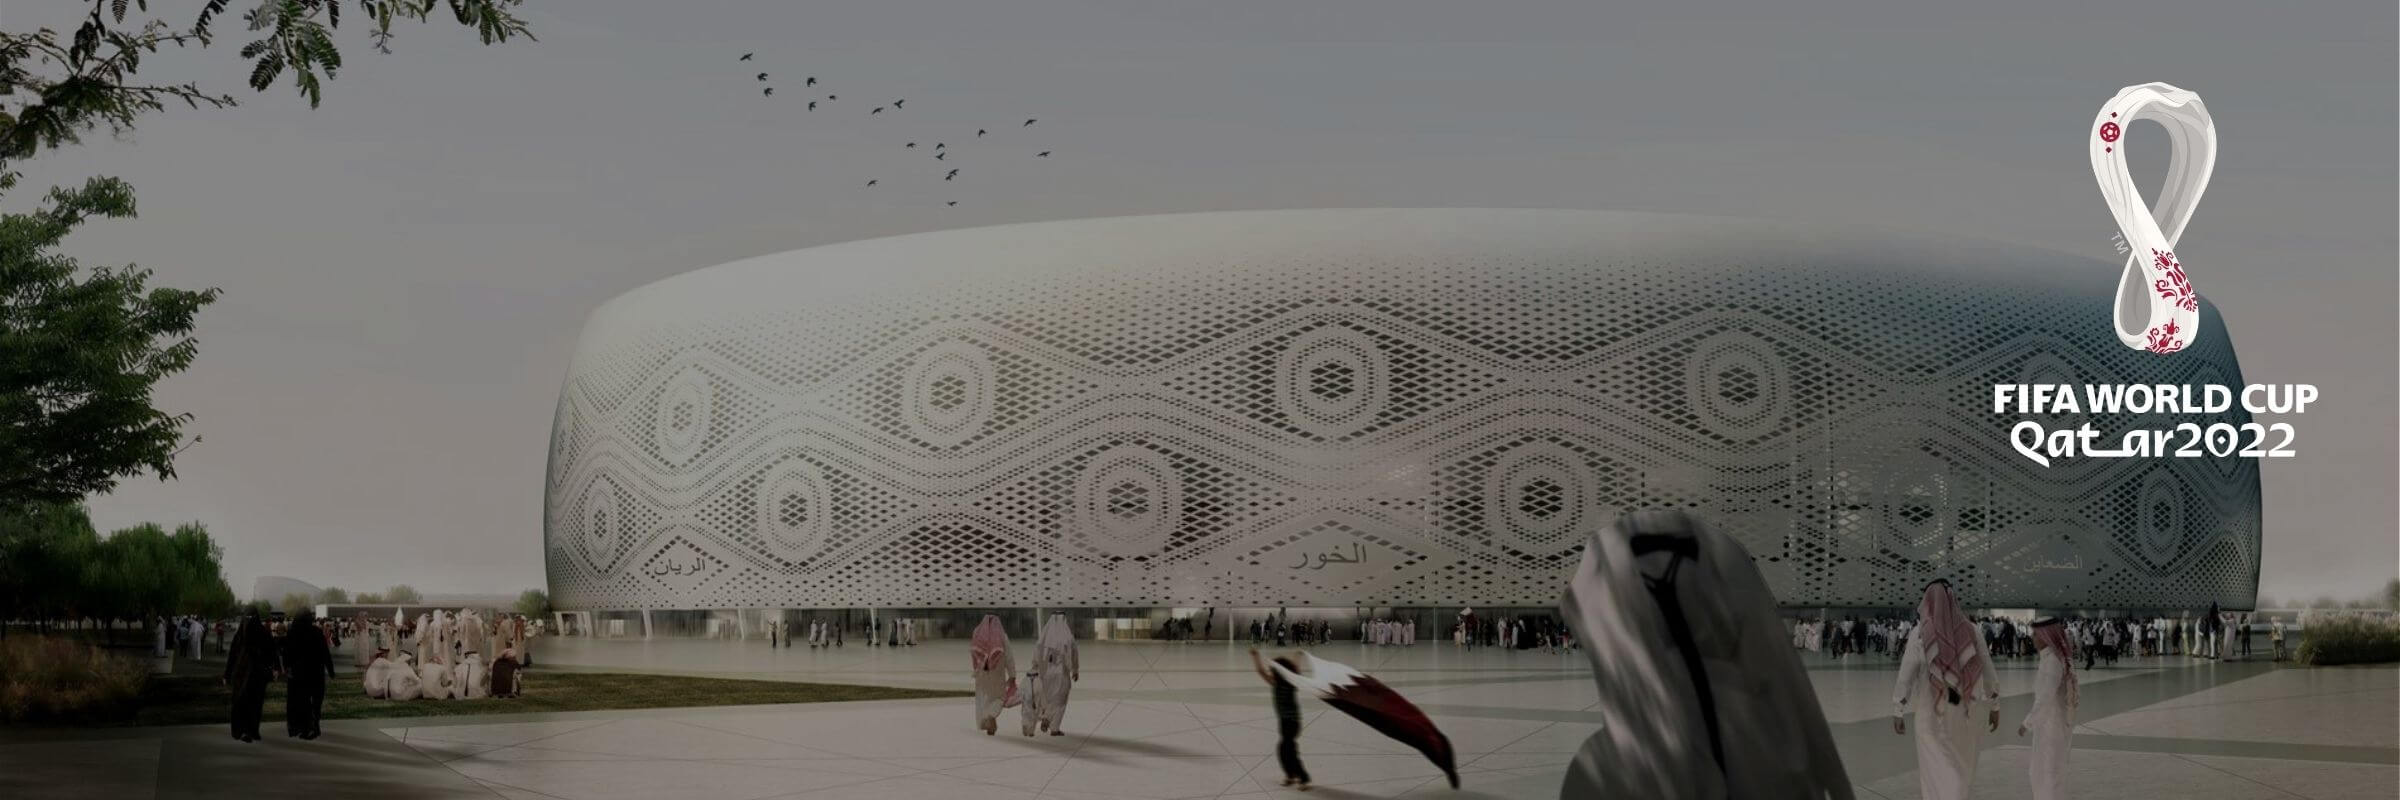 Al-Thumama-Stadium-Banner